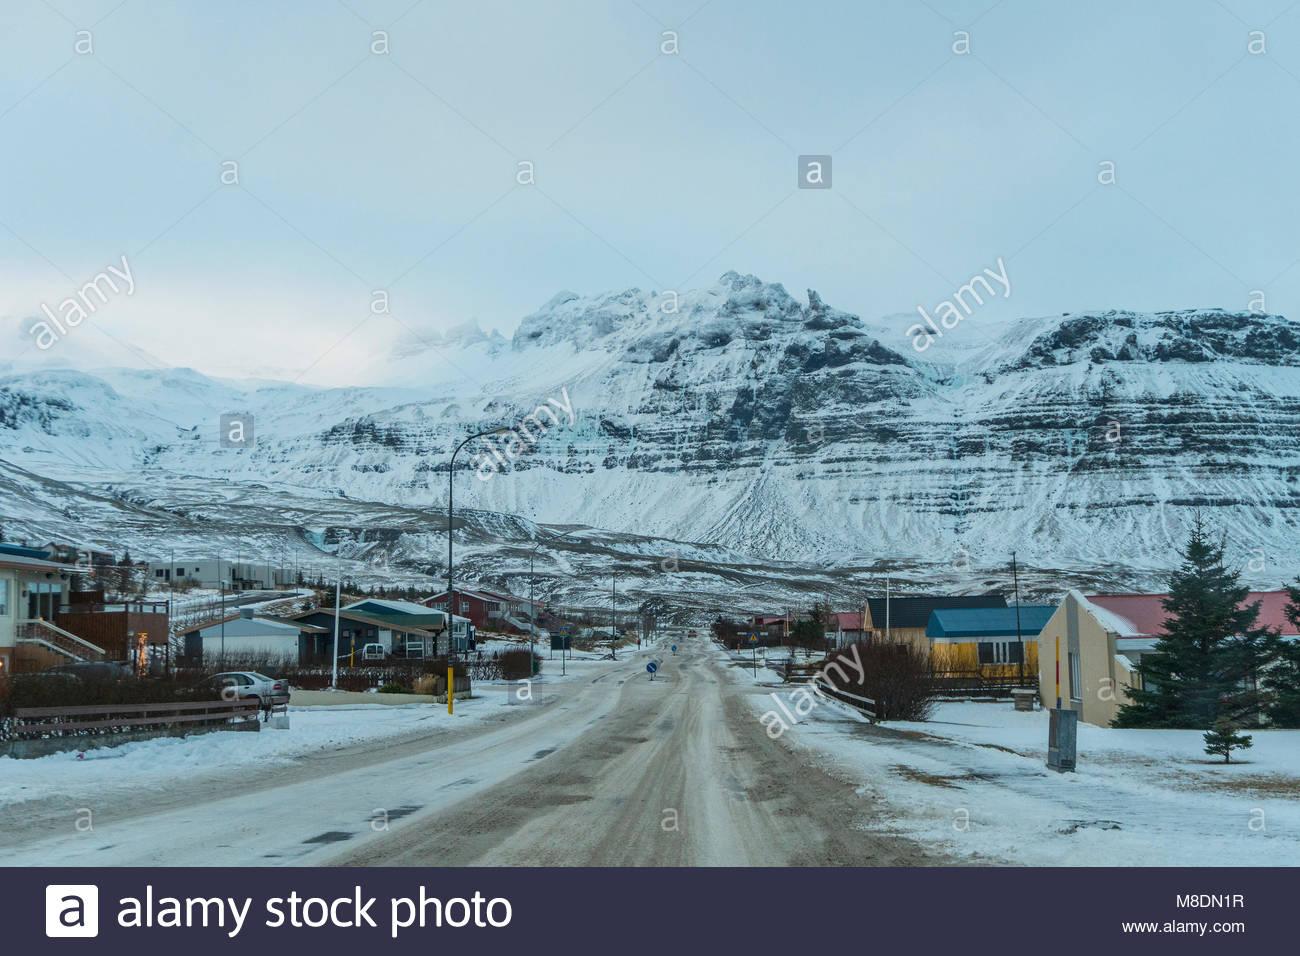 Road into small town of Grundarfjordur, Snaefellsnes Peninsula, Iceland - Stock Image